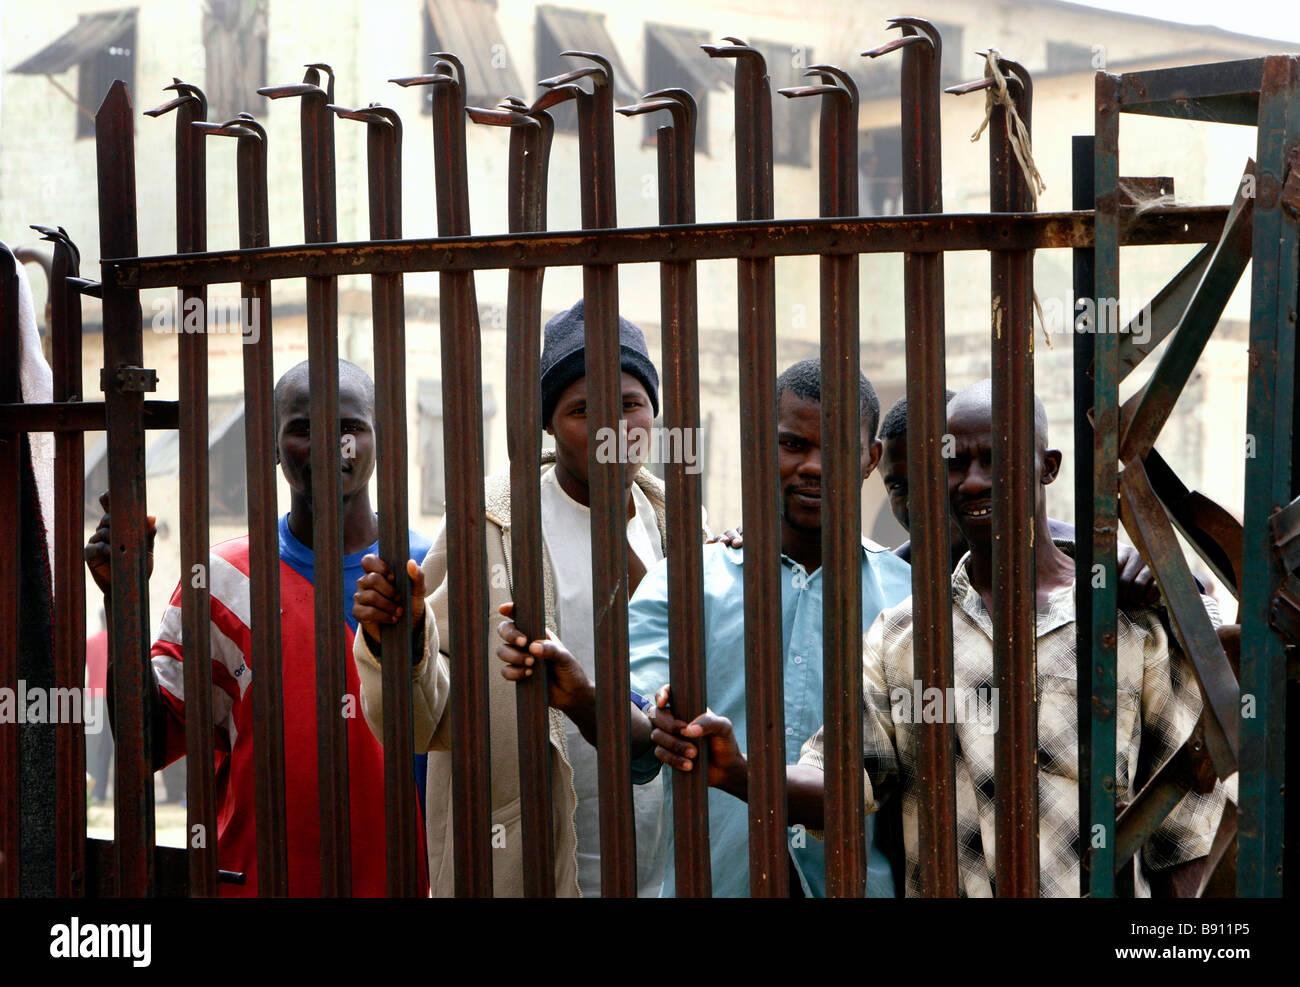 Nigeria: prisoners behind bars in the prison of Jos - Stock Image